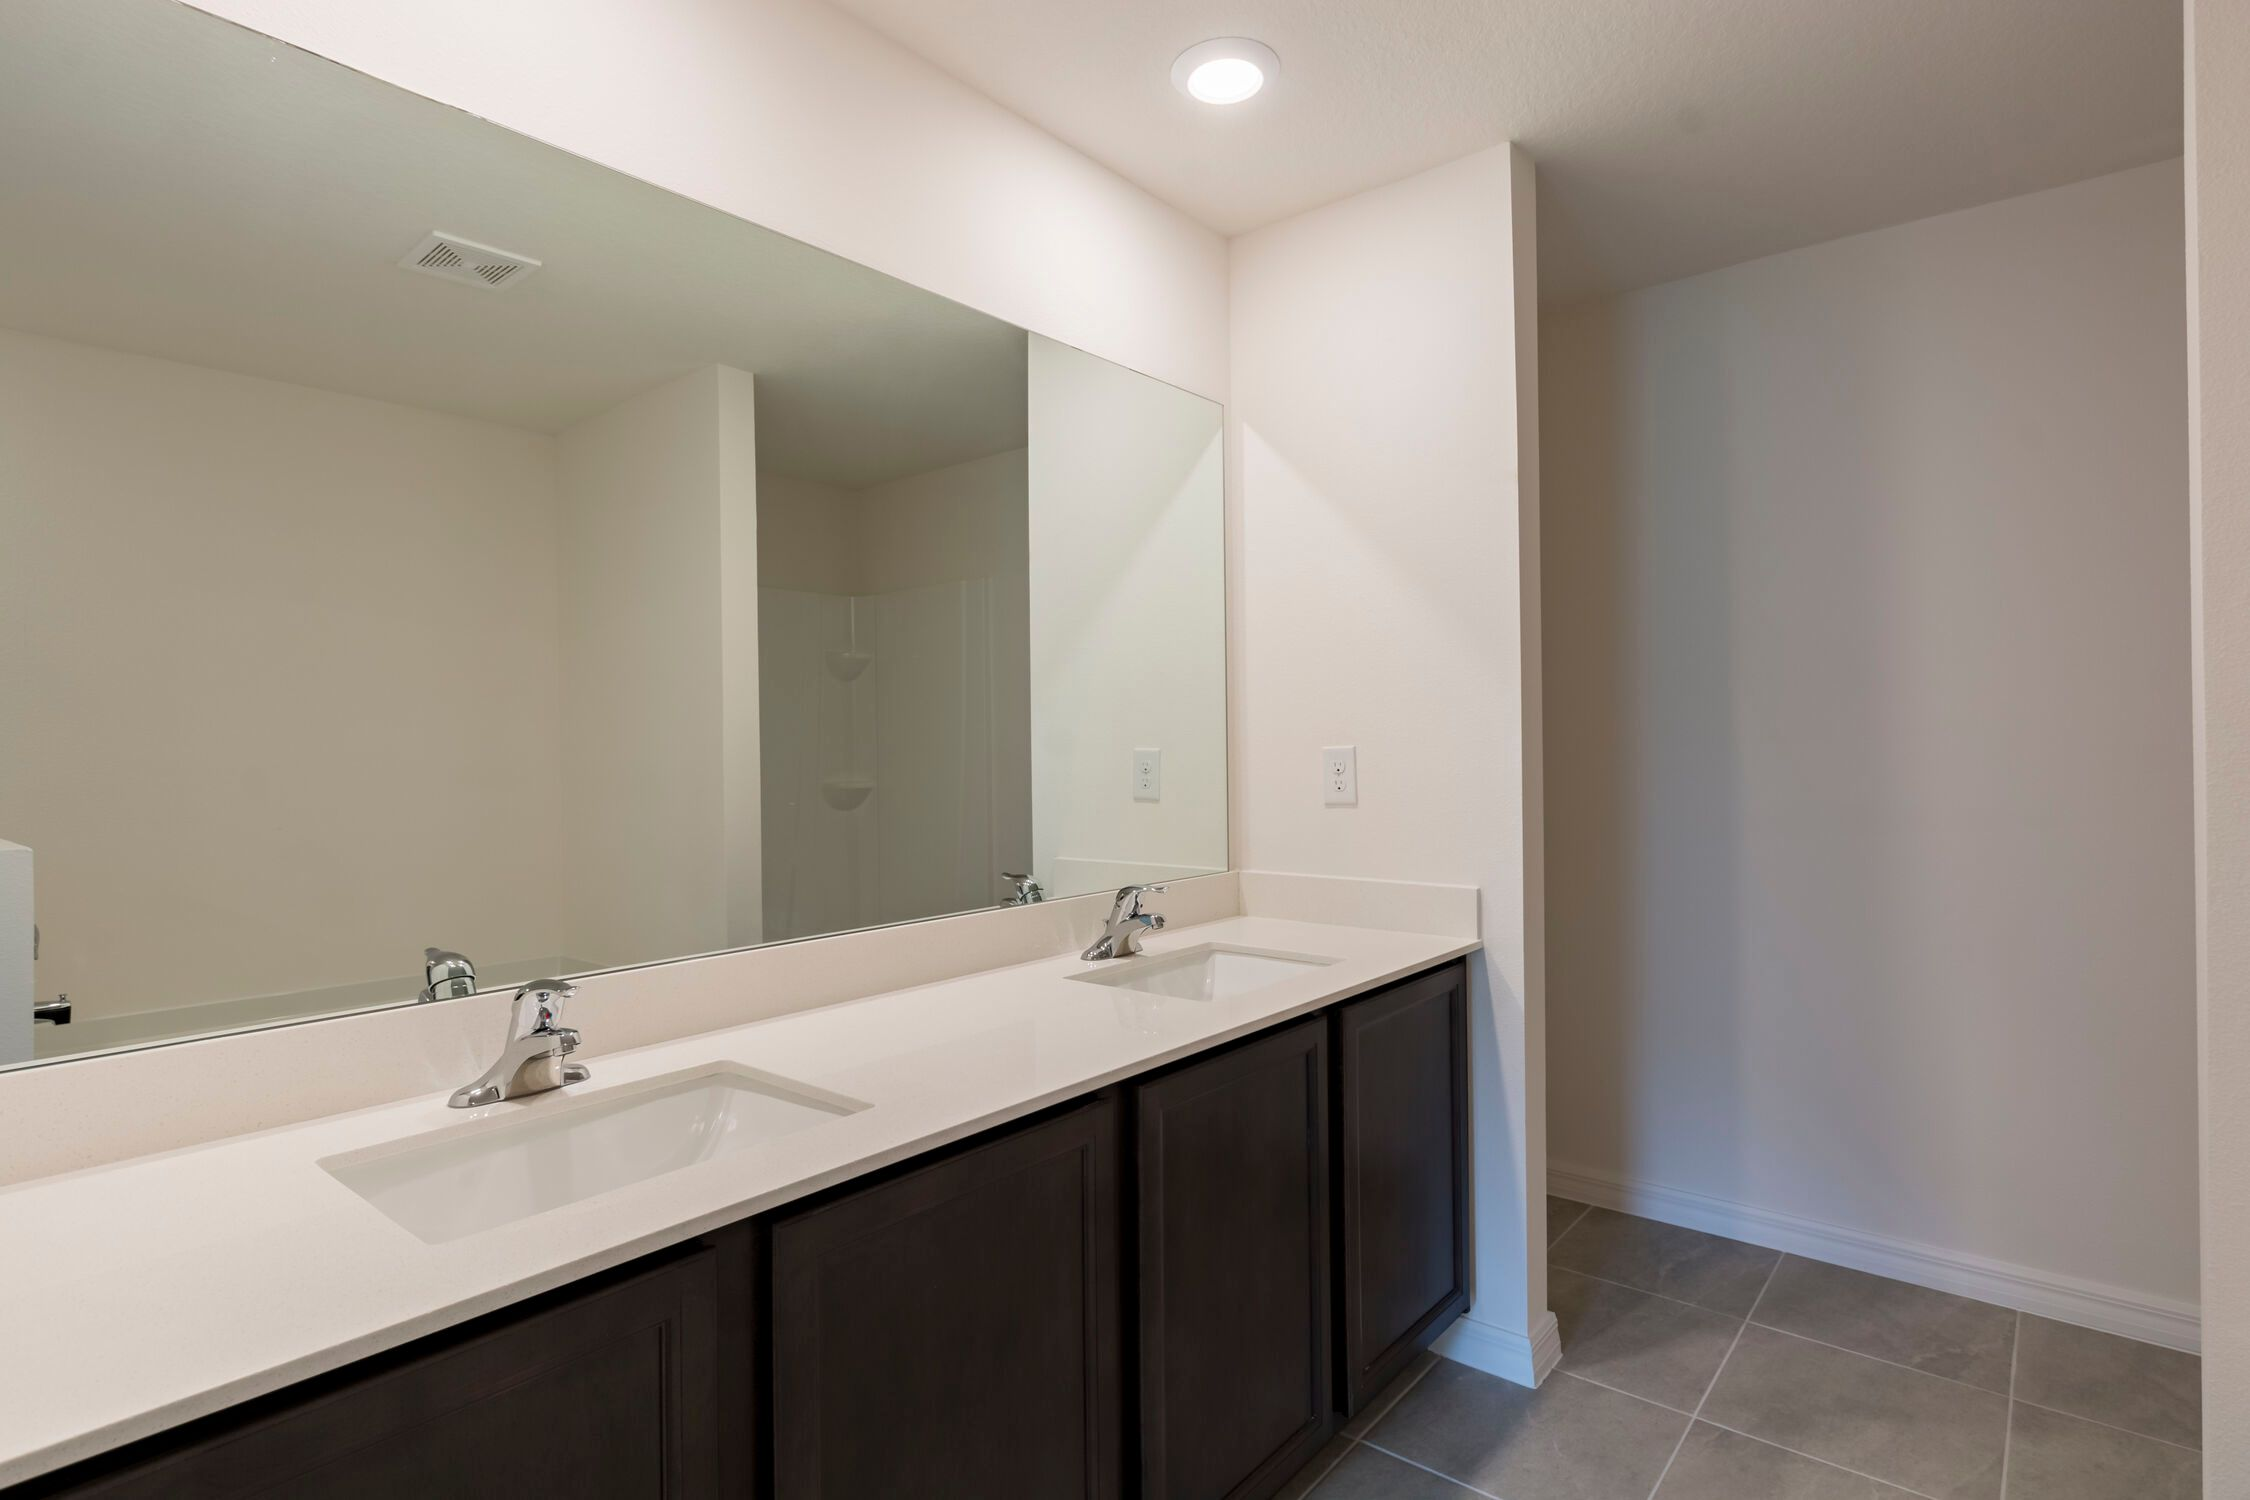 Bathroom featured in the Estero By LGI Homes in Melbourne, FL